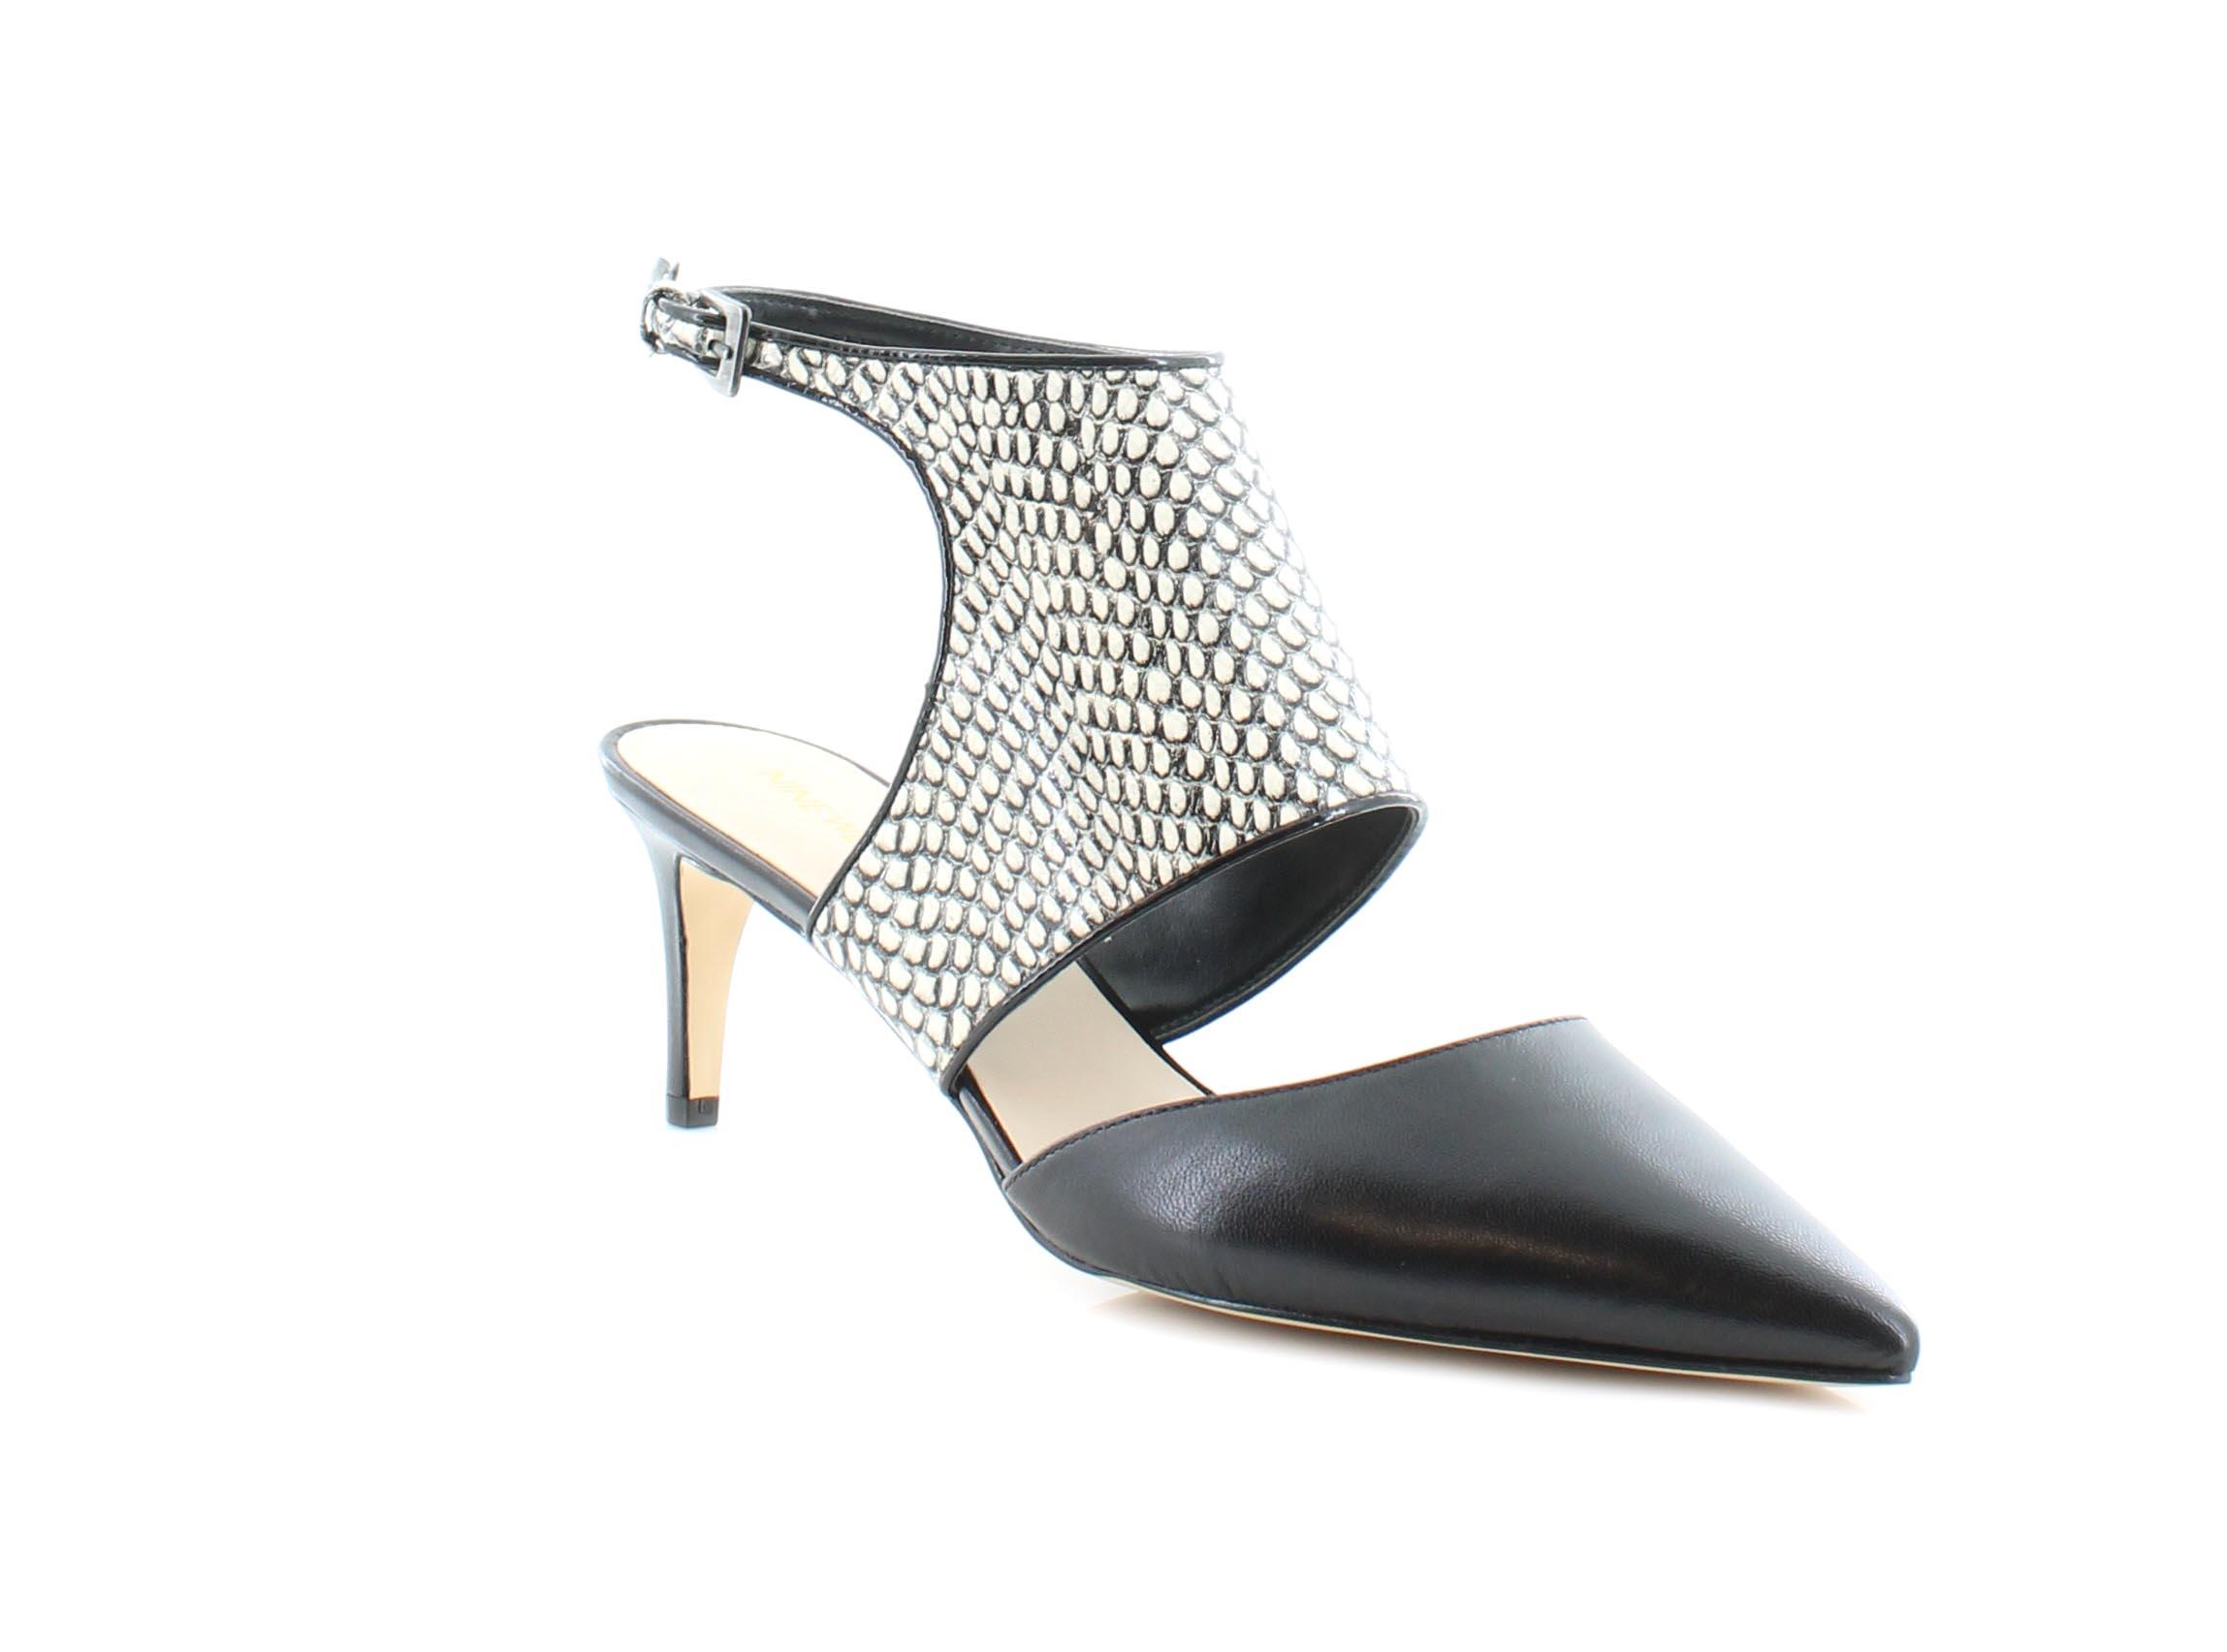 Nine West Salinda Women's Heels Bkwh/Bk Size 10 M